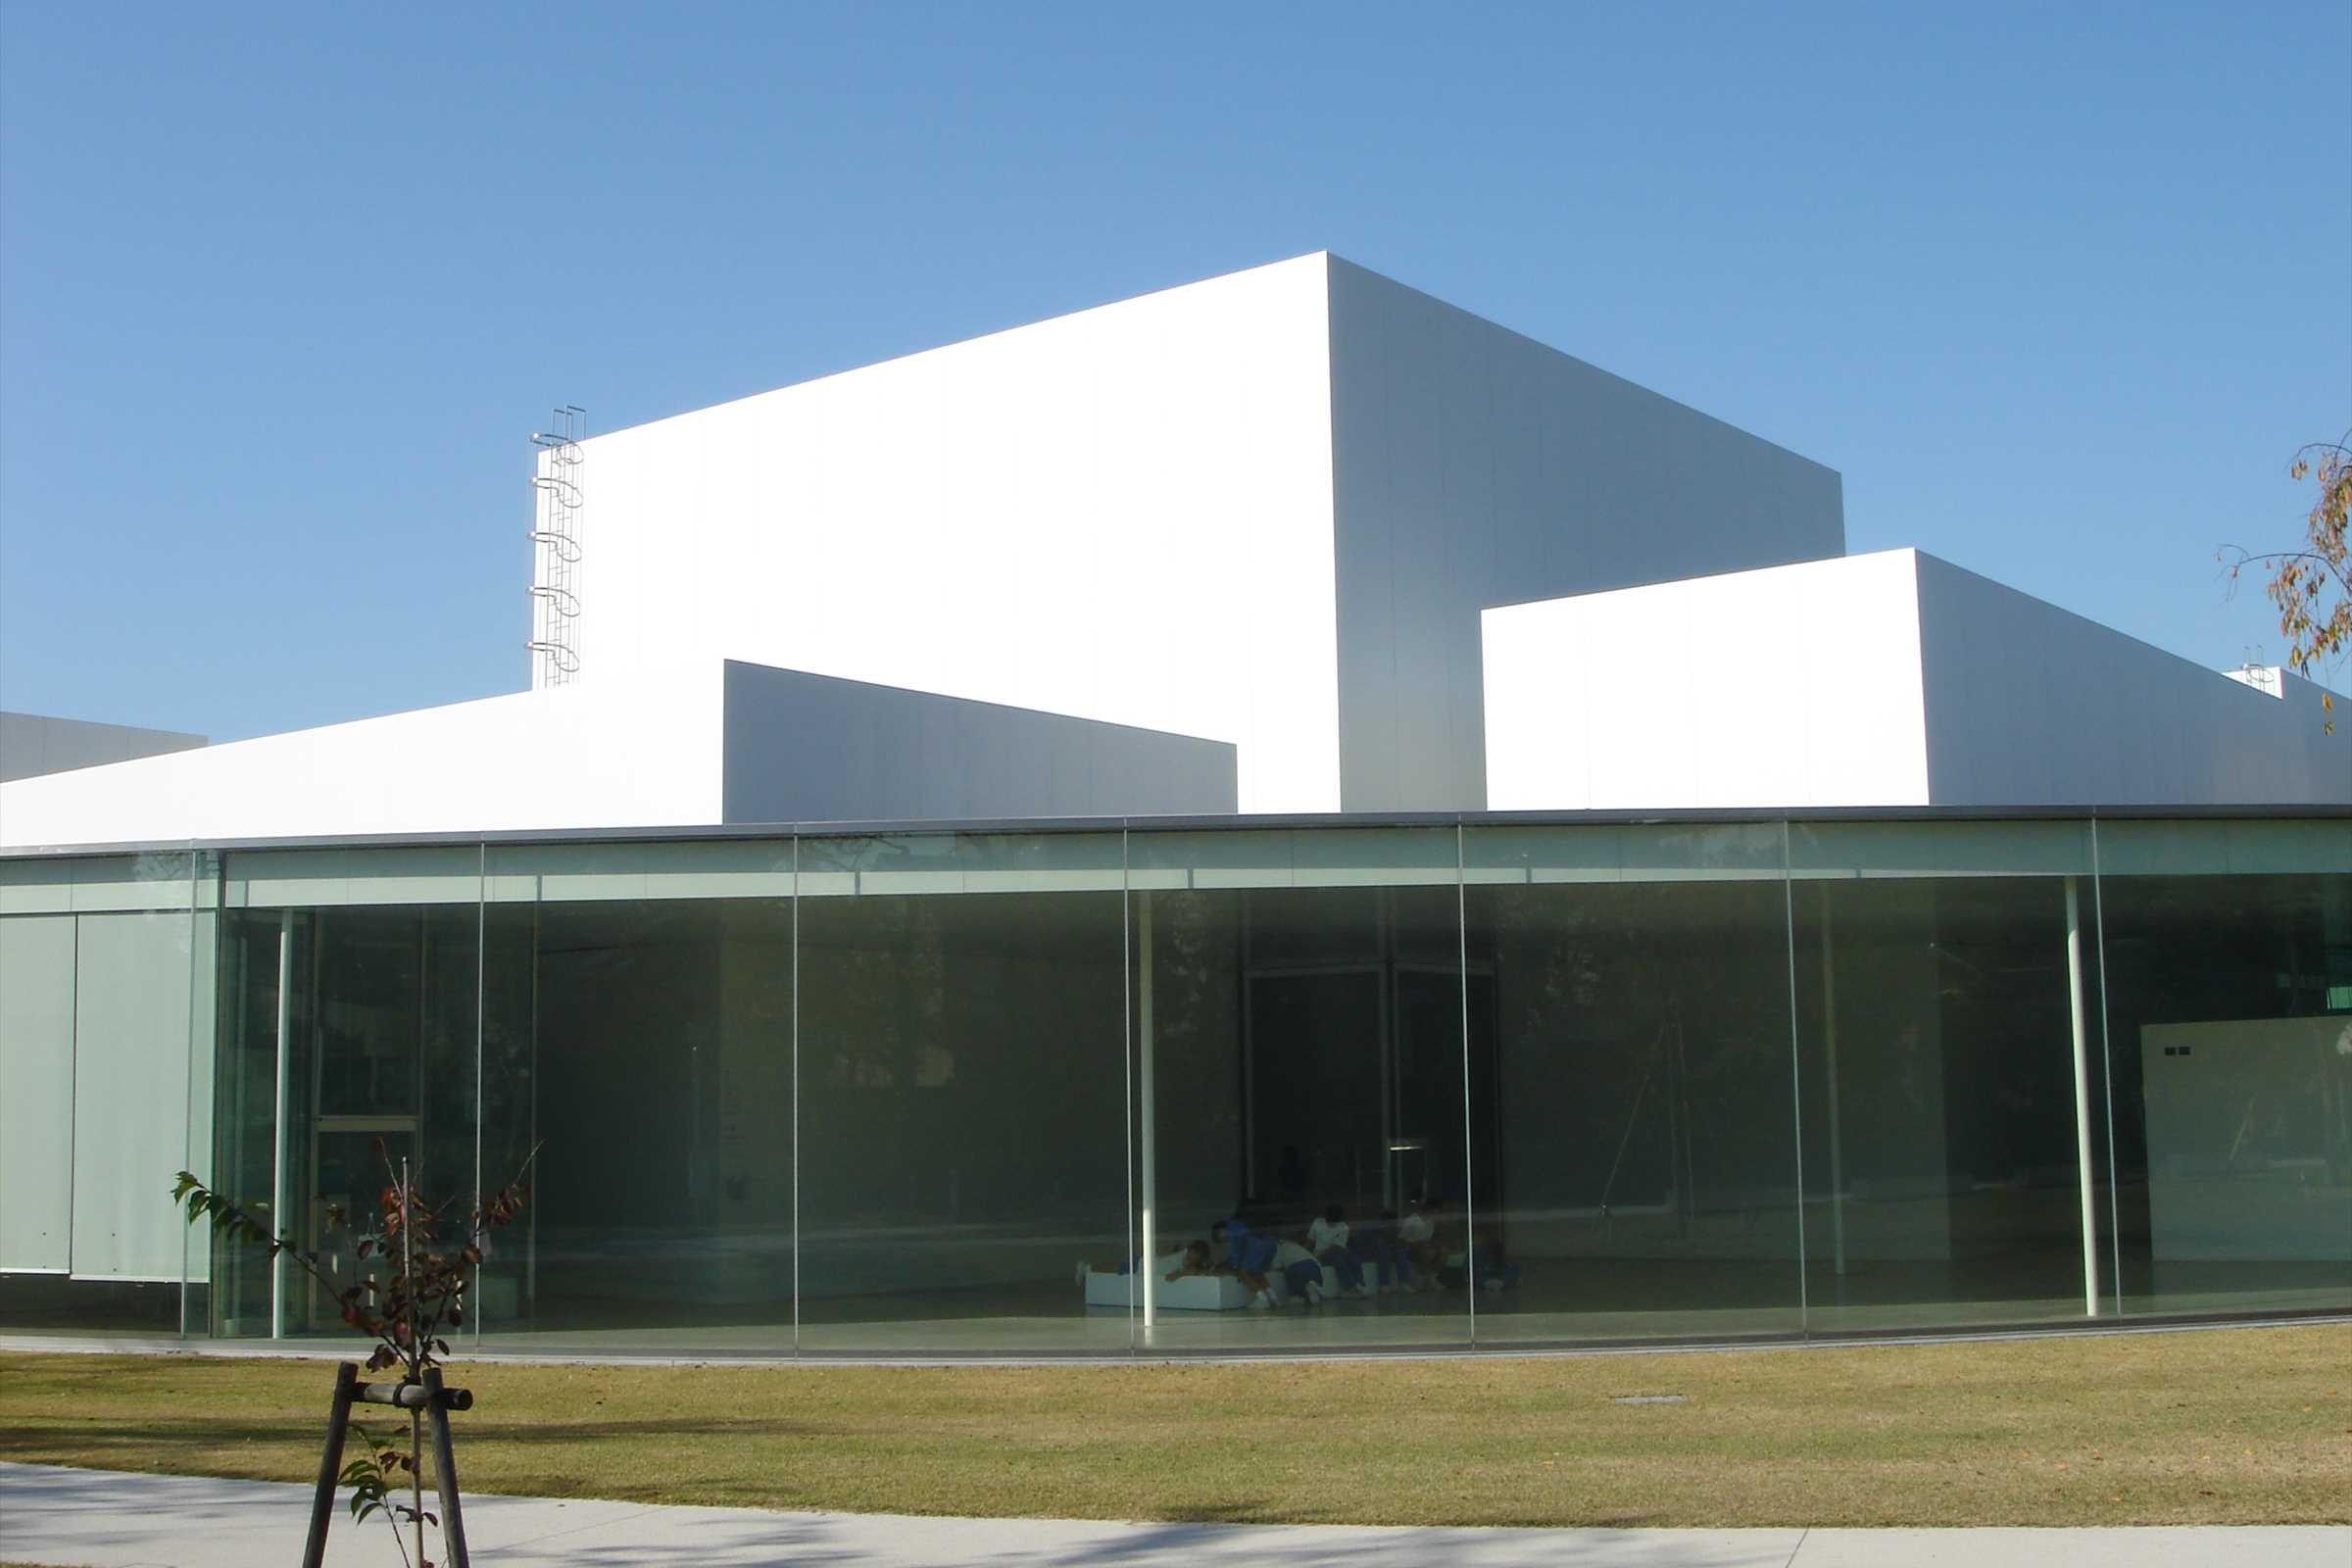 21st Century Museum of Contemporary Art, Kanazawa